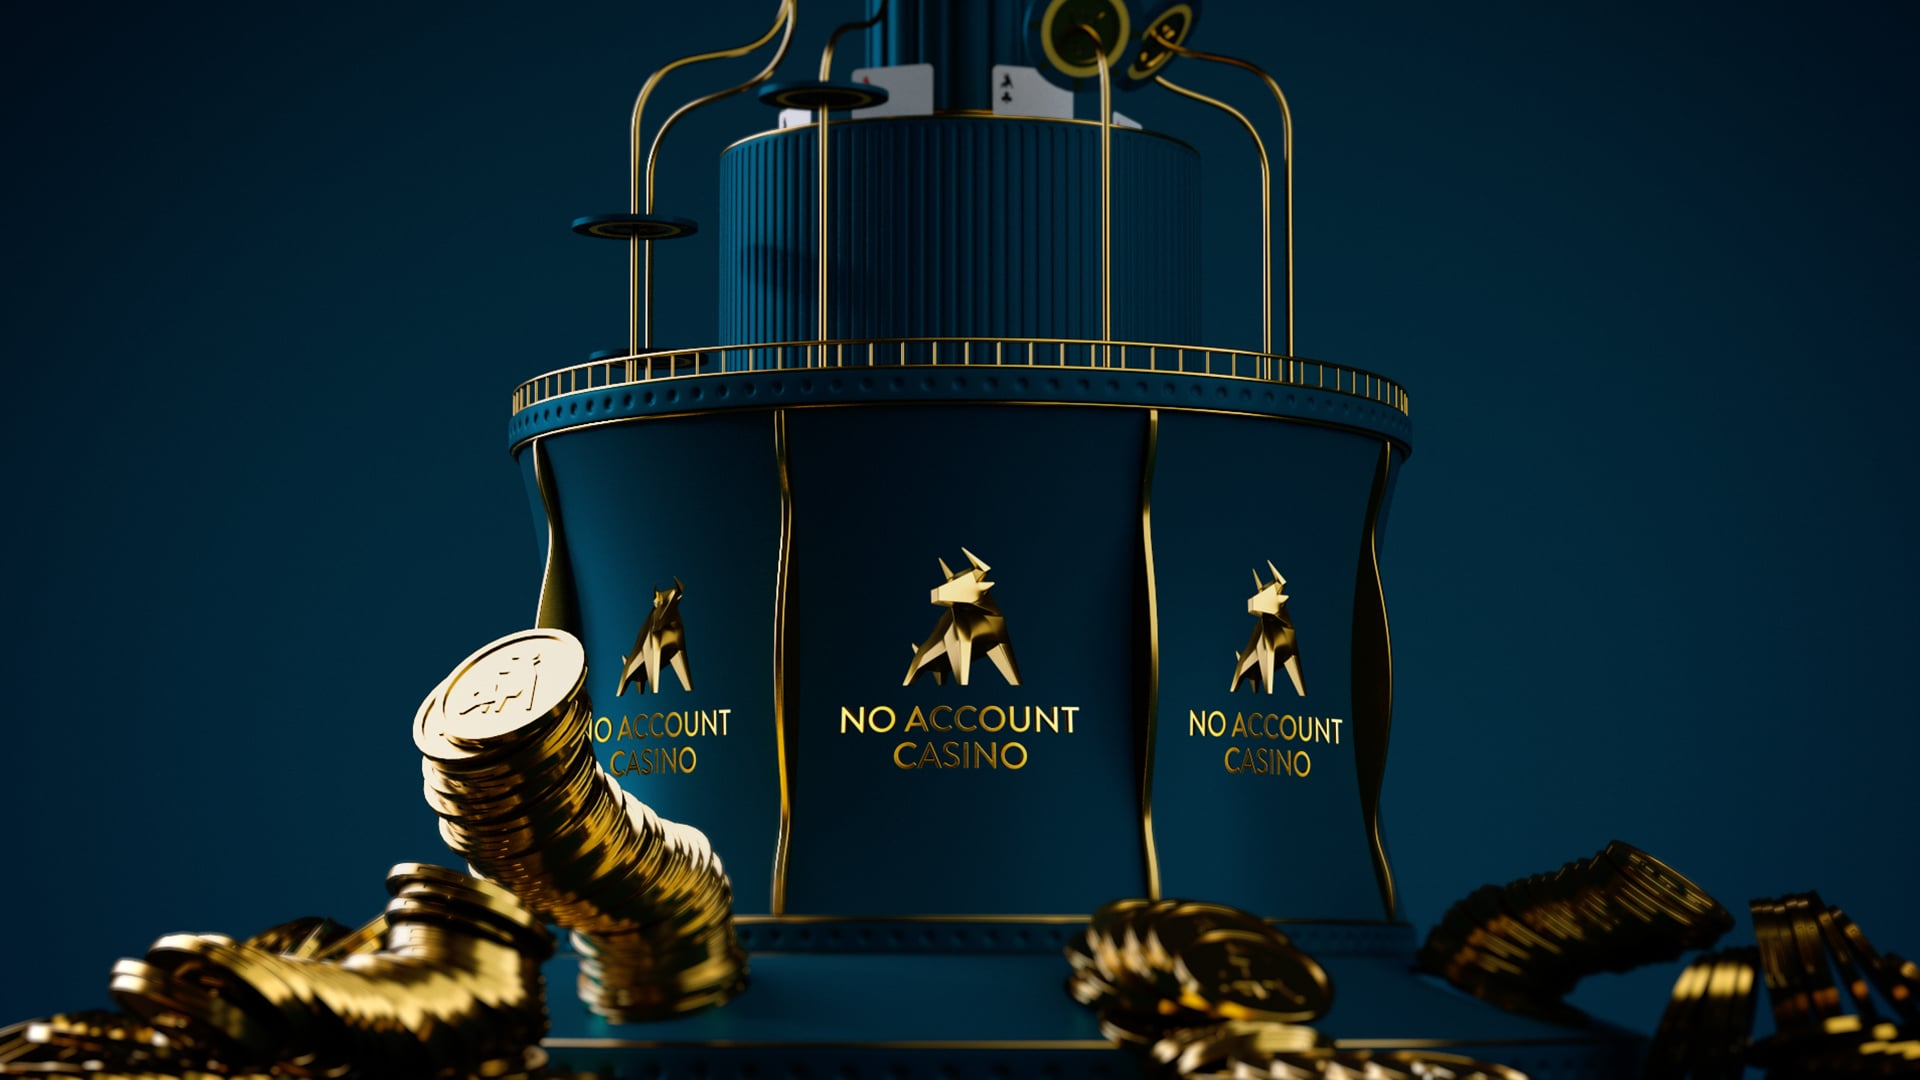 Stillbild i 3D visandes No account casino staty